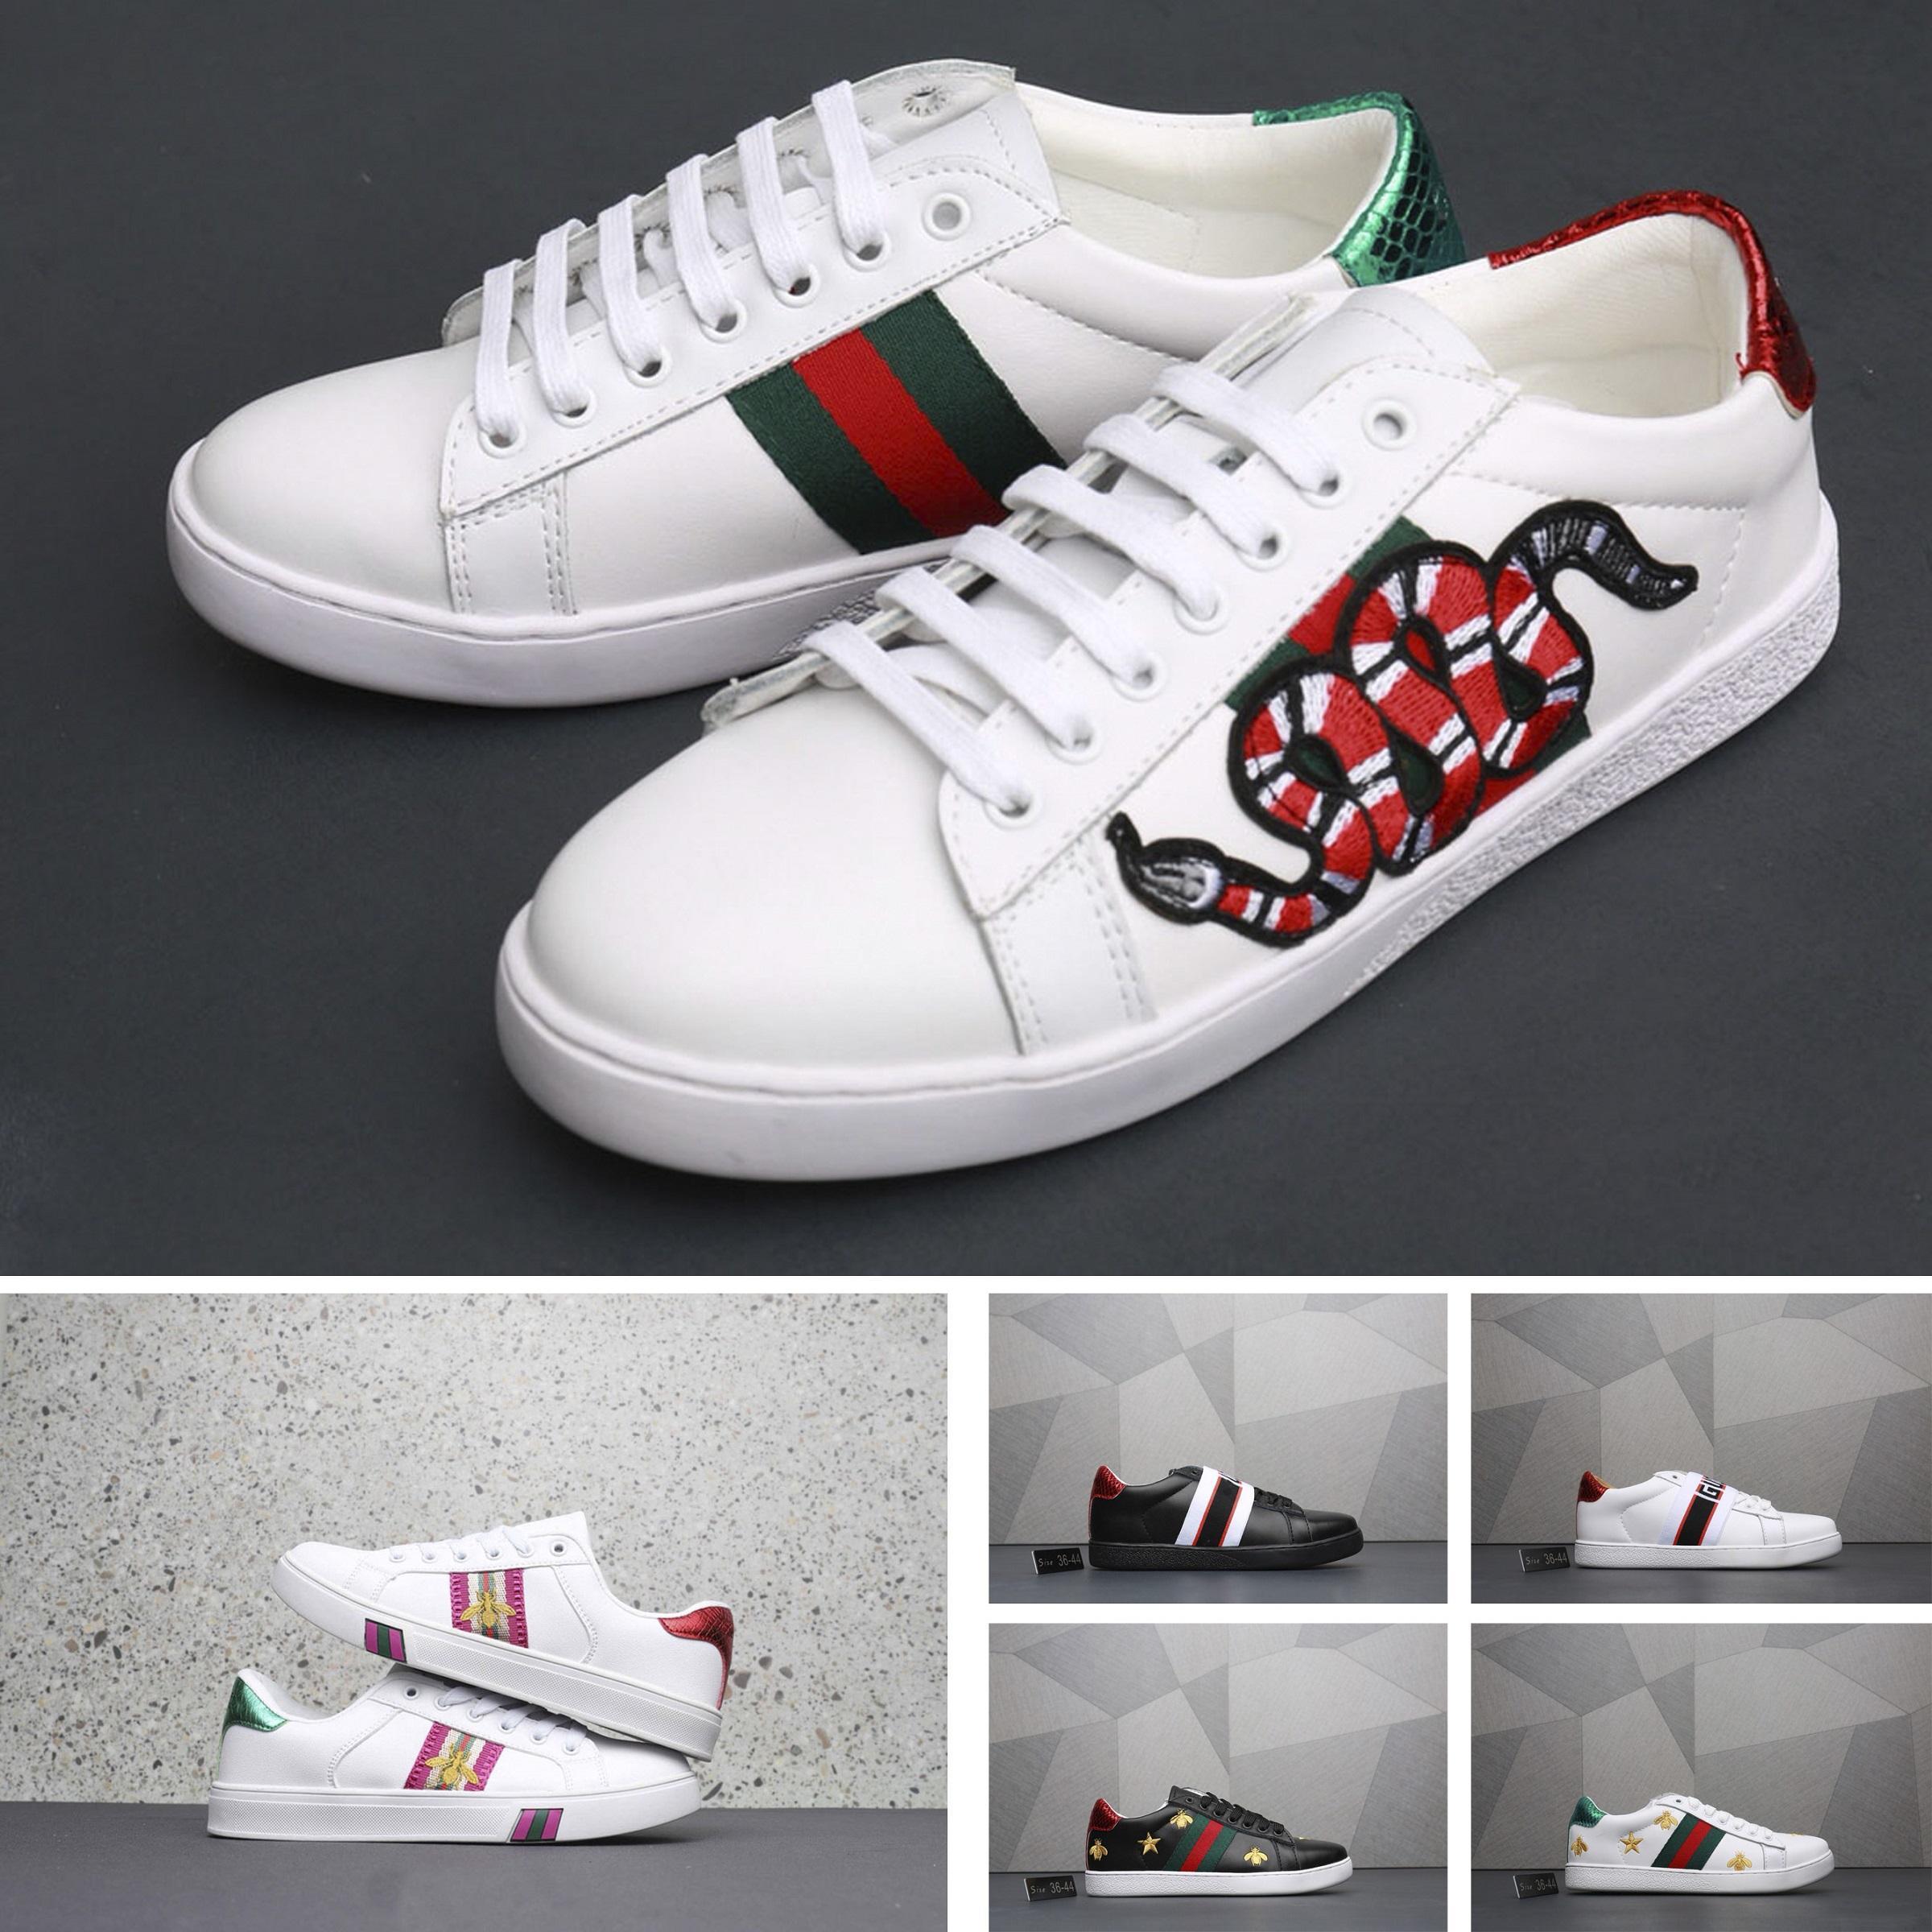 75f4b803a Compre Gucci Shoes Women Tennis Shoes Gucci Men Shoes Tennis Shoes Best  Selling Sneakers Bordados Tênis, Letras Bordadas, Cosmos, Tênis, Cabeça De  Lobo, ...